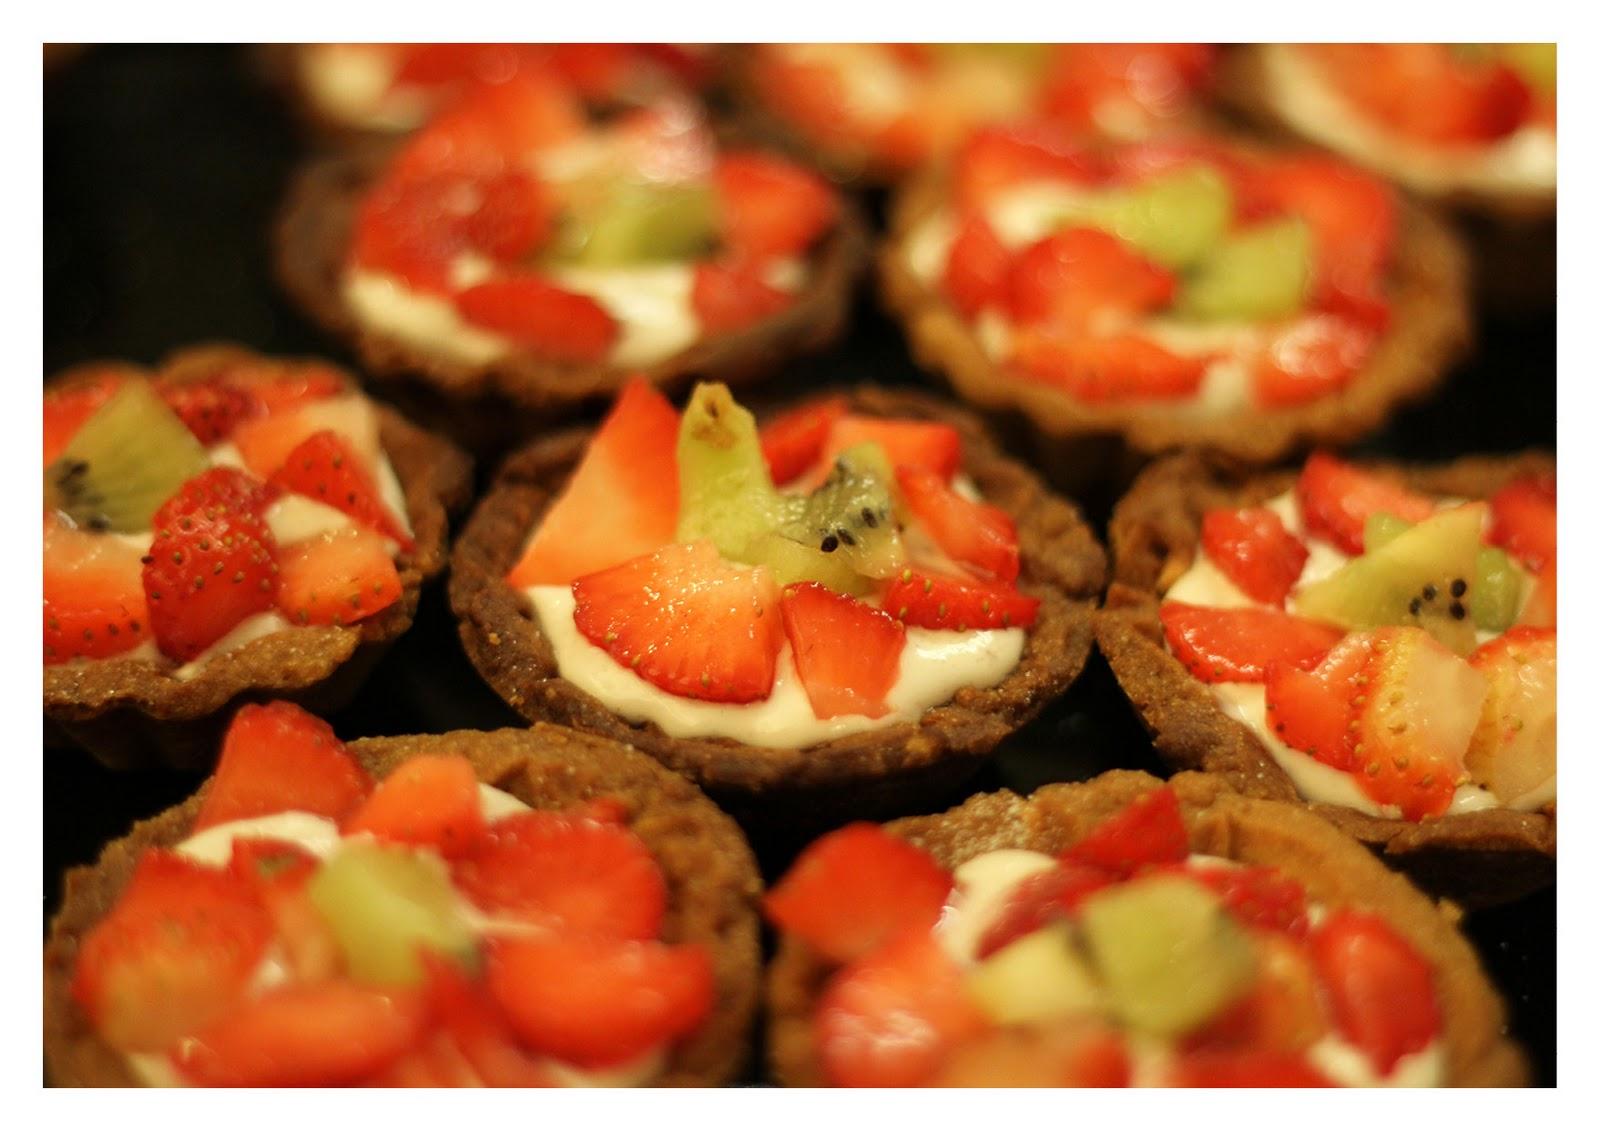 strawberry cream cheese tarts tipsy tart with brandy cream waffles